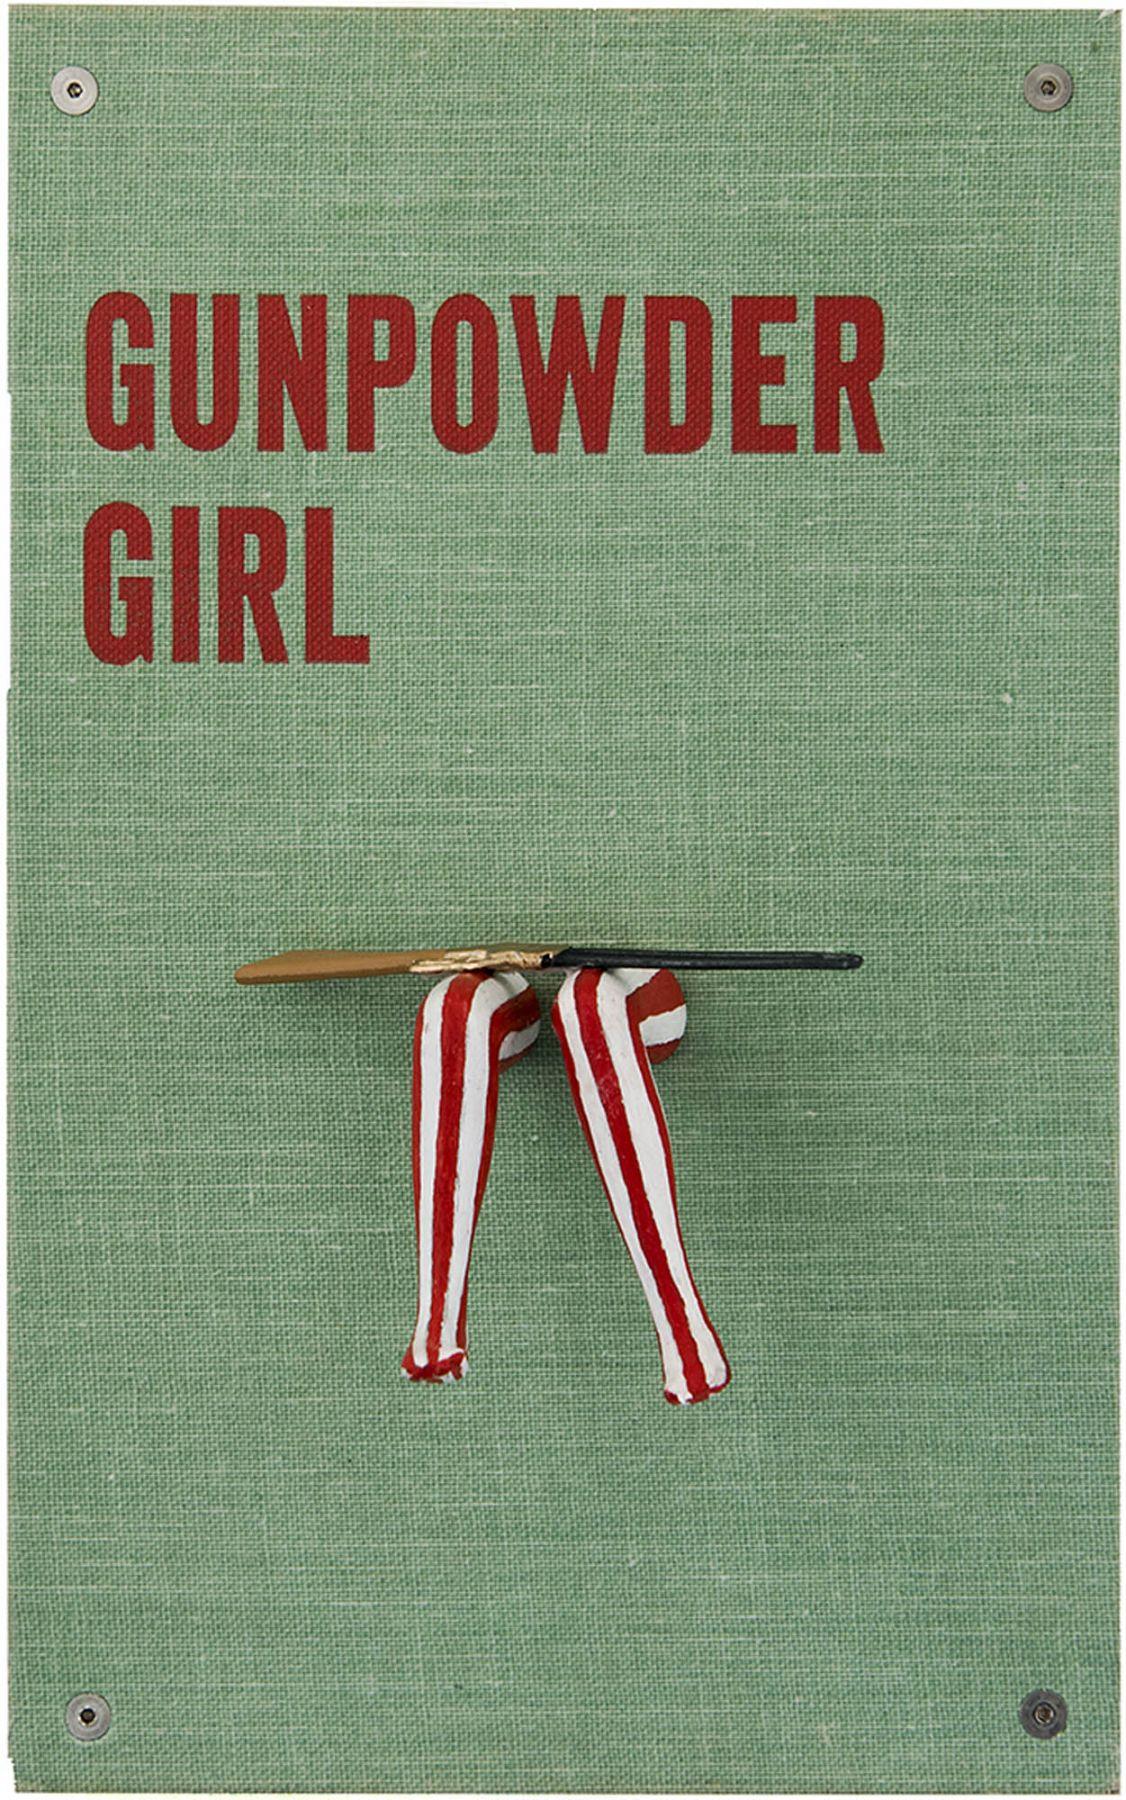 Nancy Gifford, Gunpowder Girl - #metoo Series, 2017